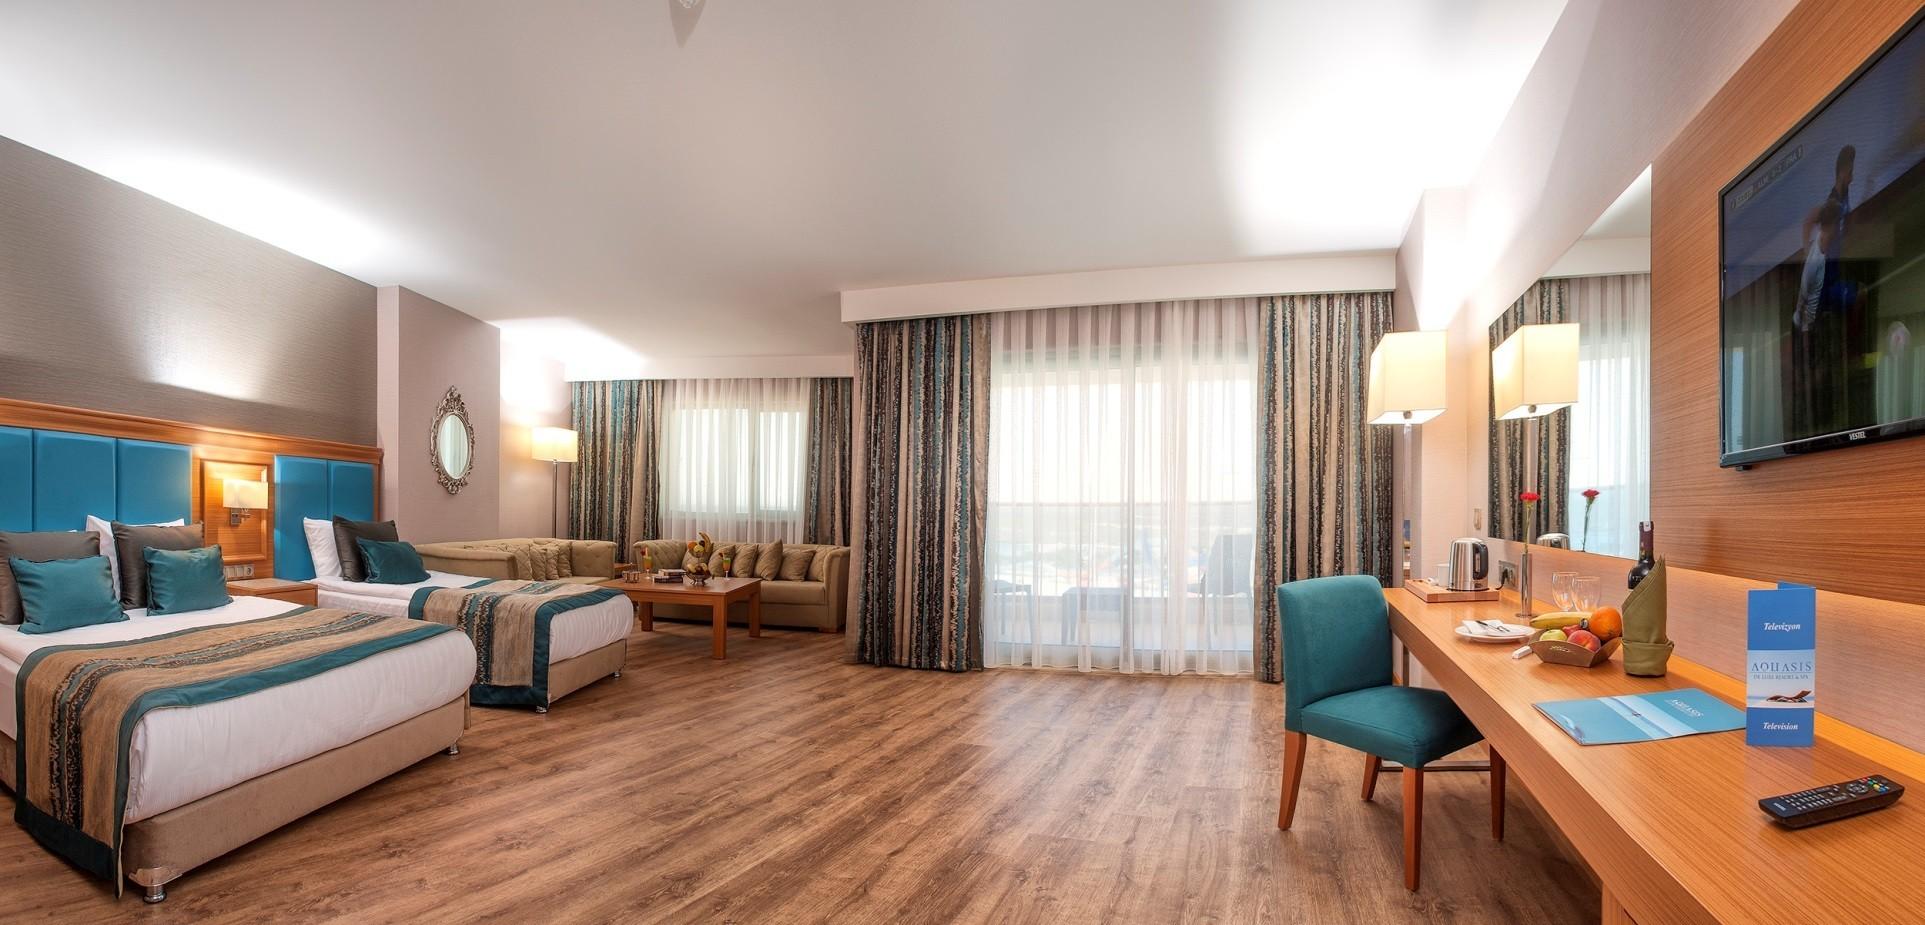 Aquasis De Luxe Resort & Spa - апартамент